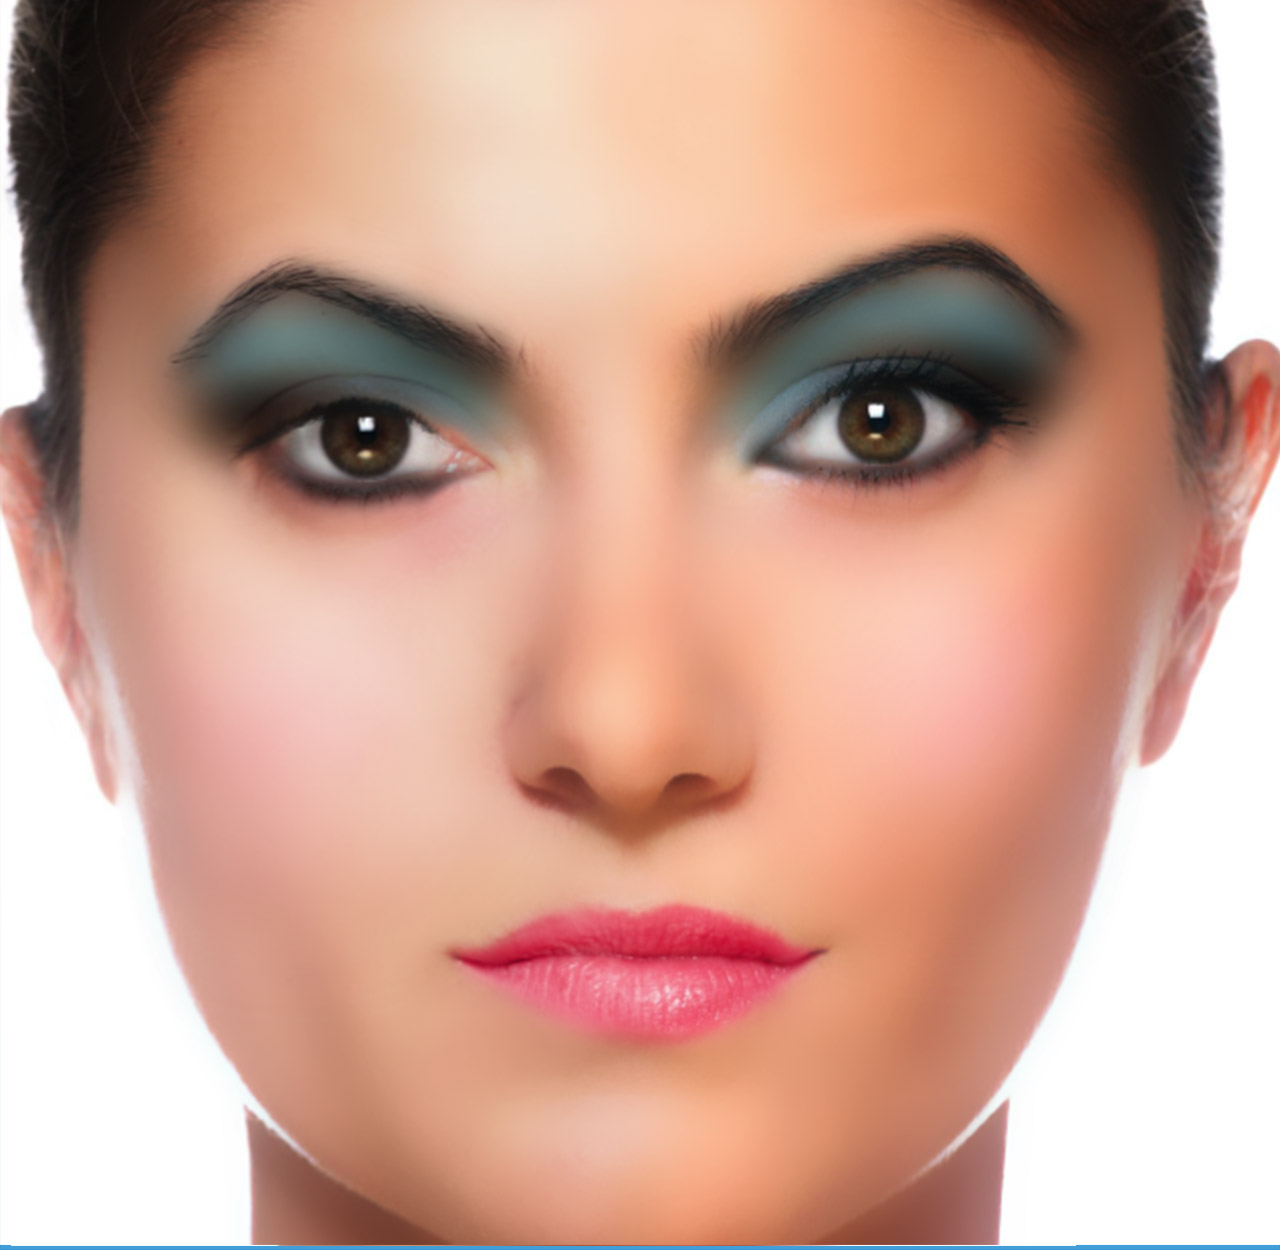 tutoriel maquillage yeux photoshop. Black Bedroom Furniture Sets. Home Design Ideas